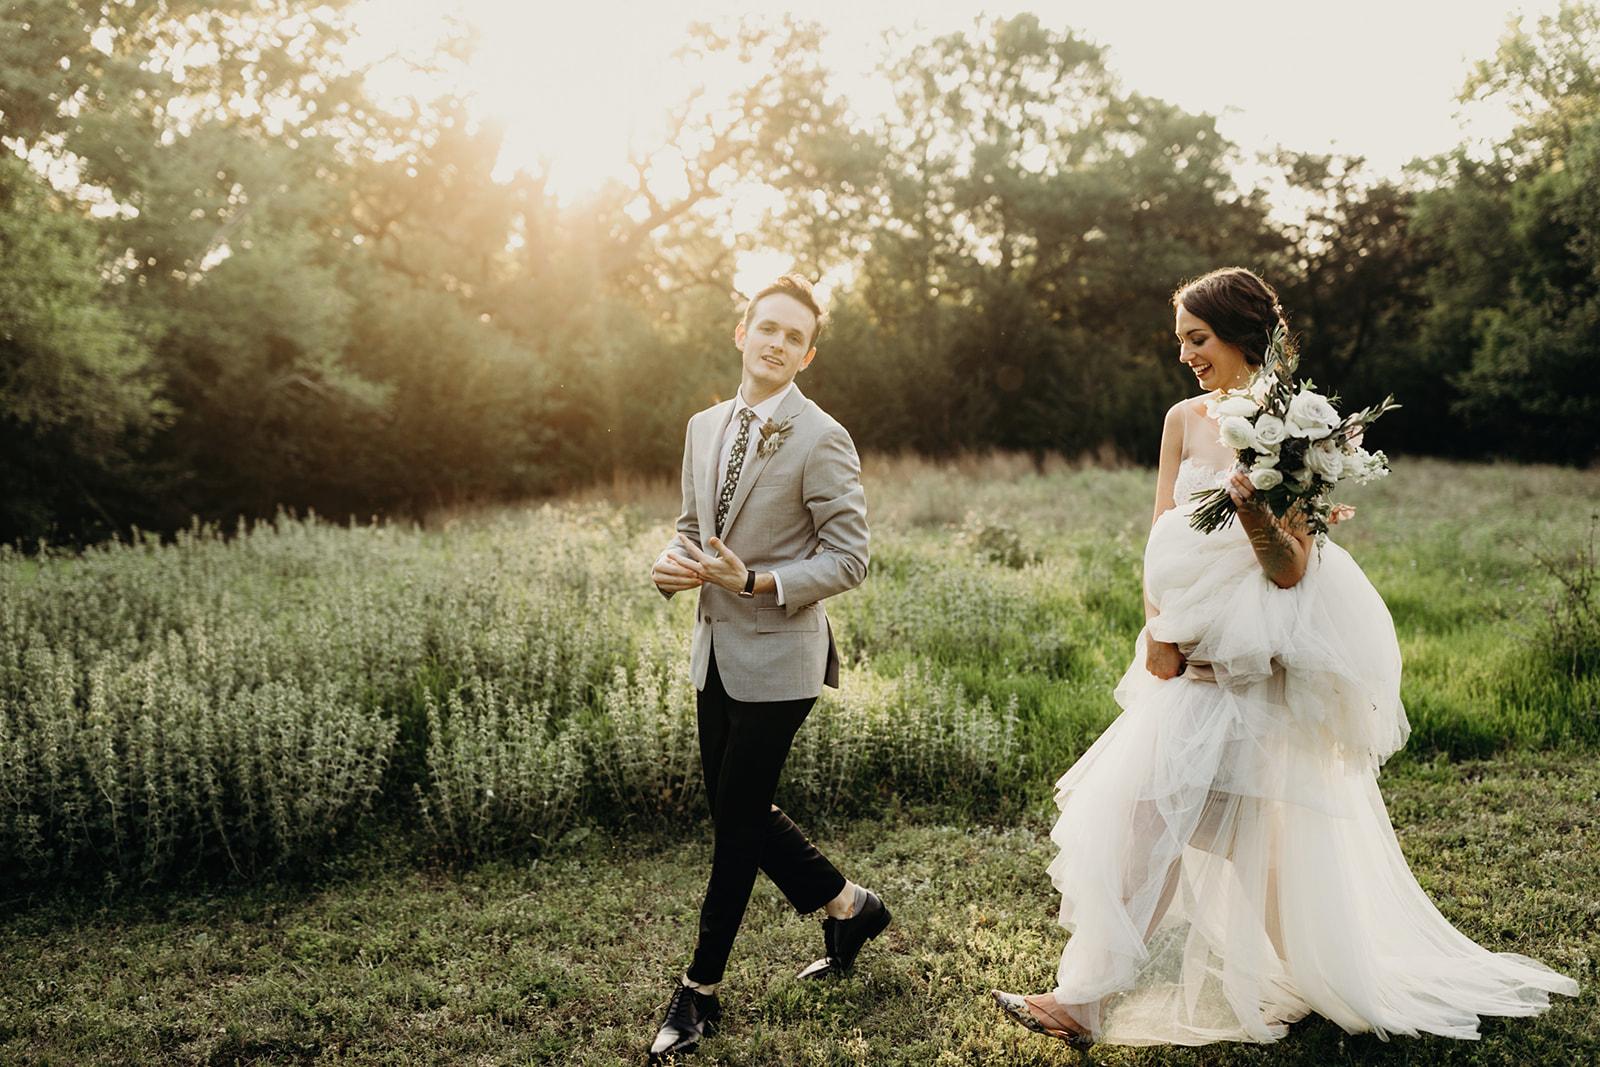 austin-wedding-lindsey-bryce-487.jpg